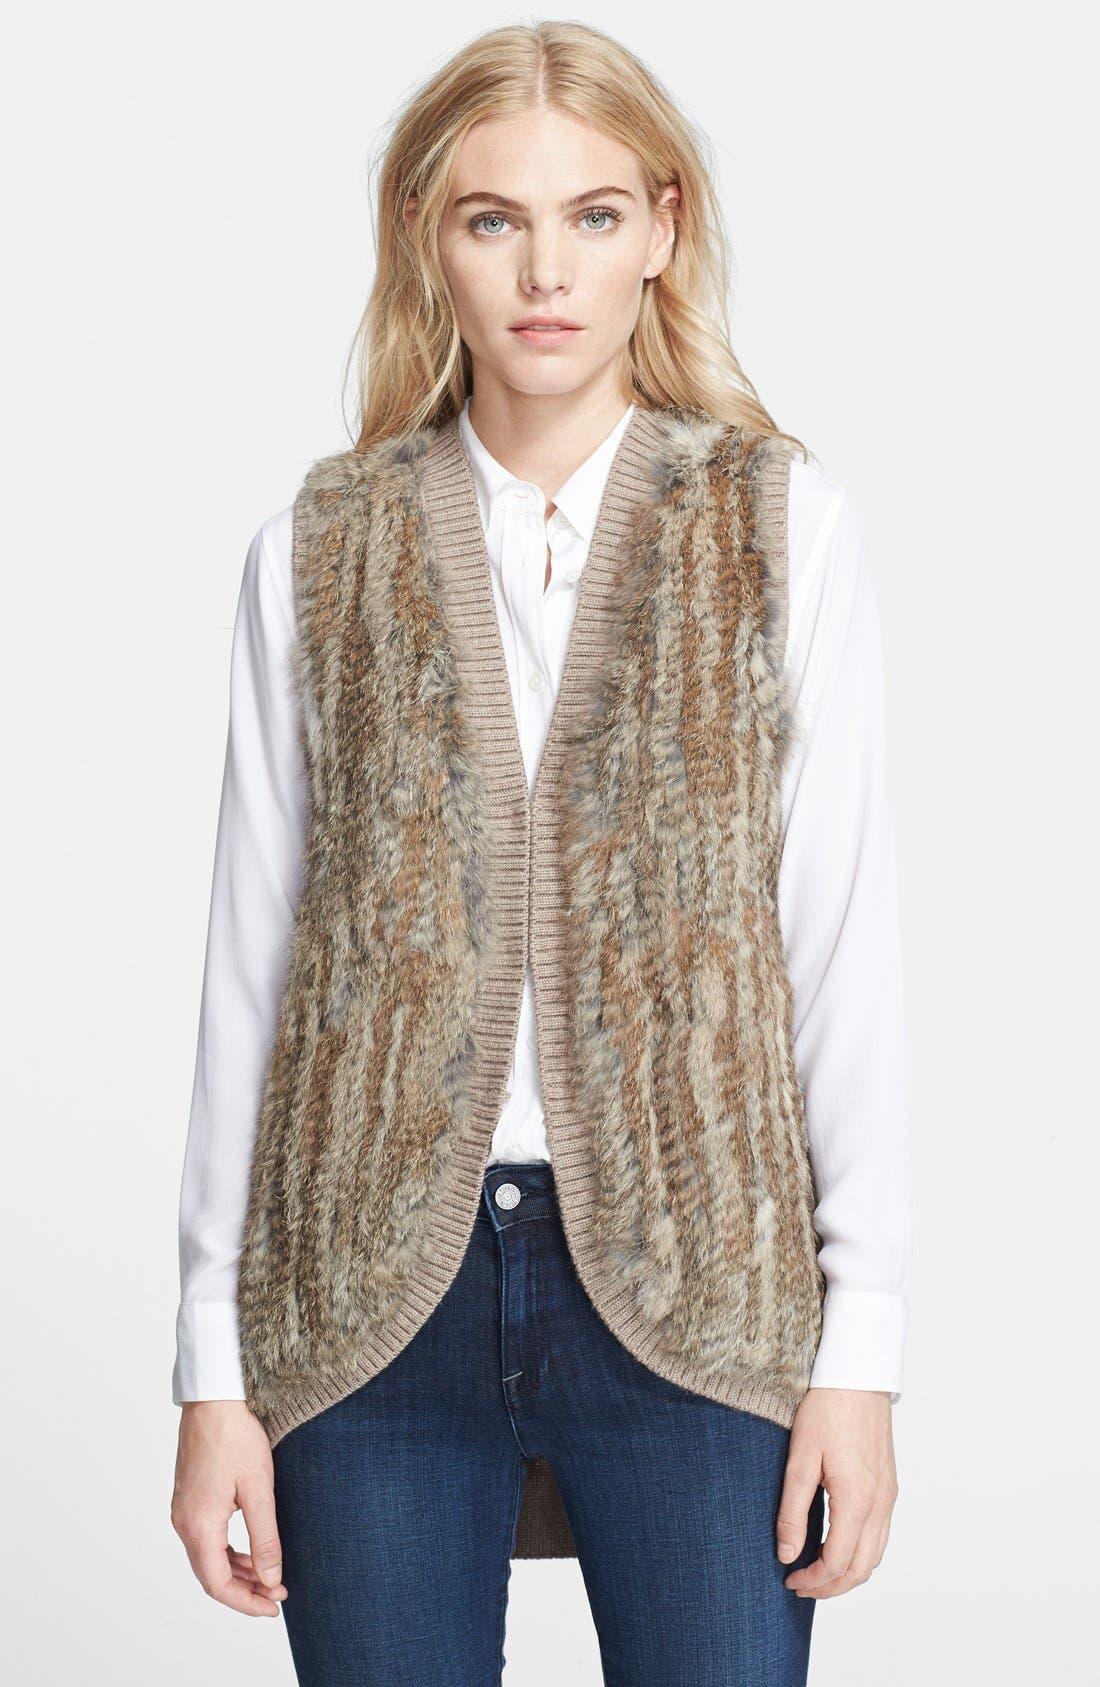 Alternate Image 1 Selected - Joie 'Ellera' Genuine Rabbit Fur Sleeveless Jacket